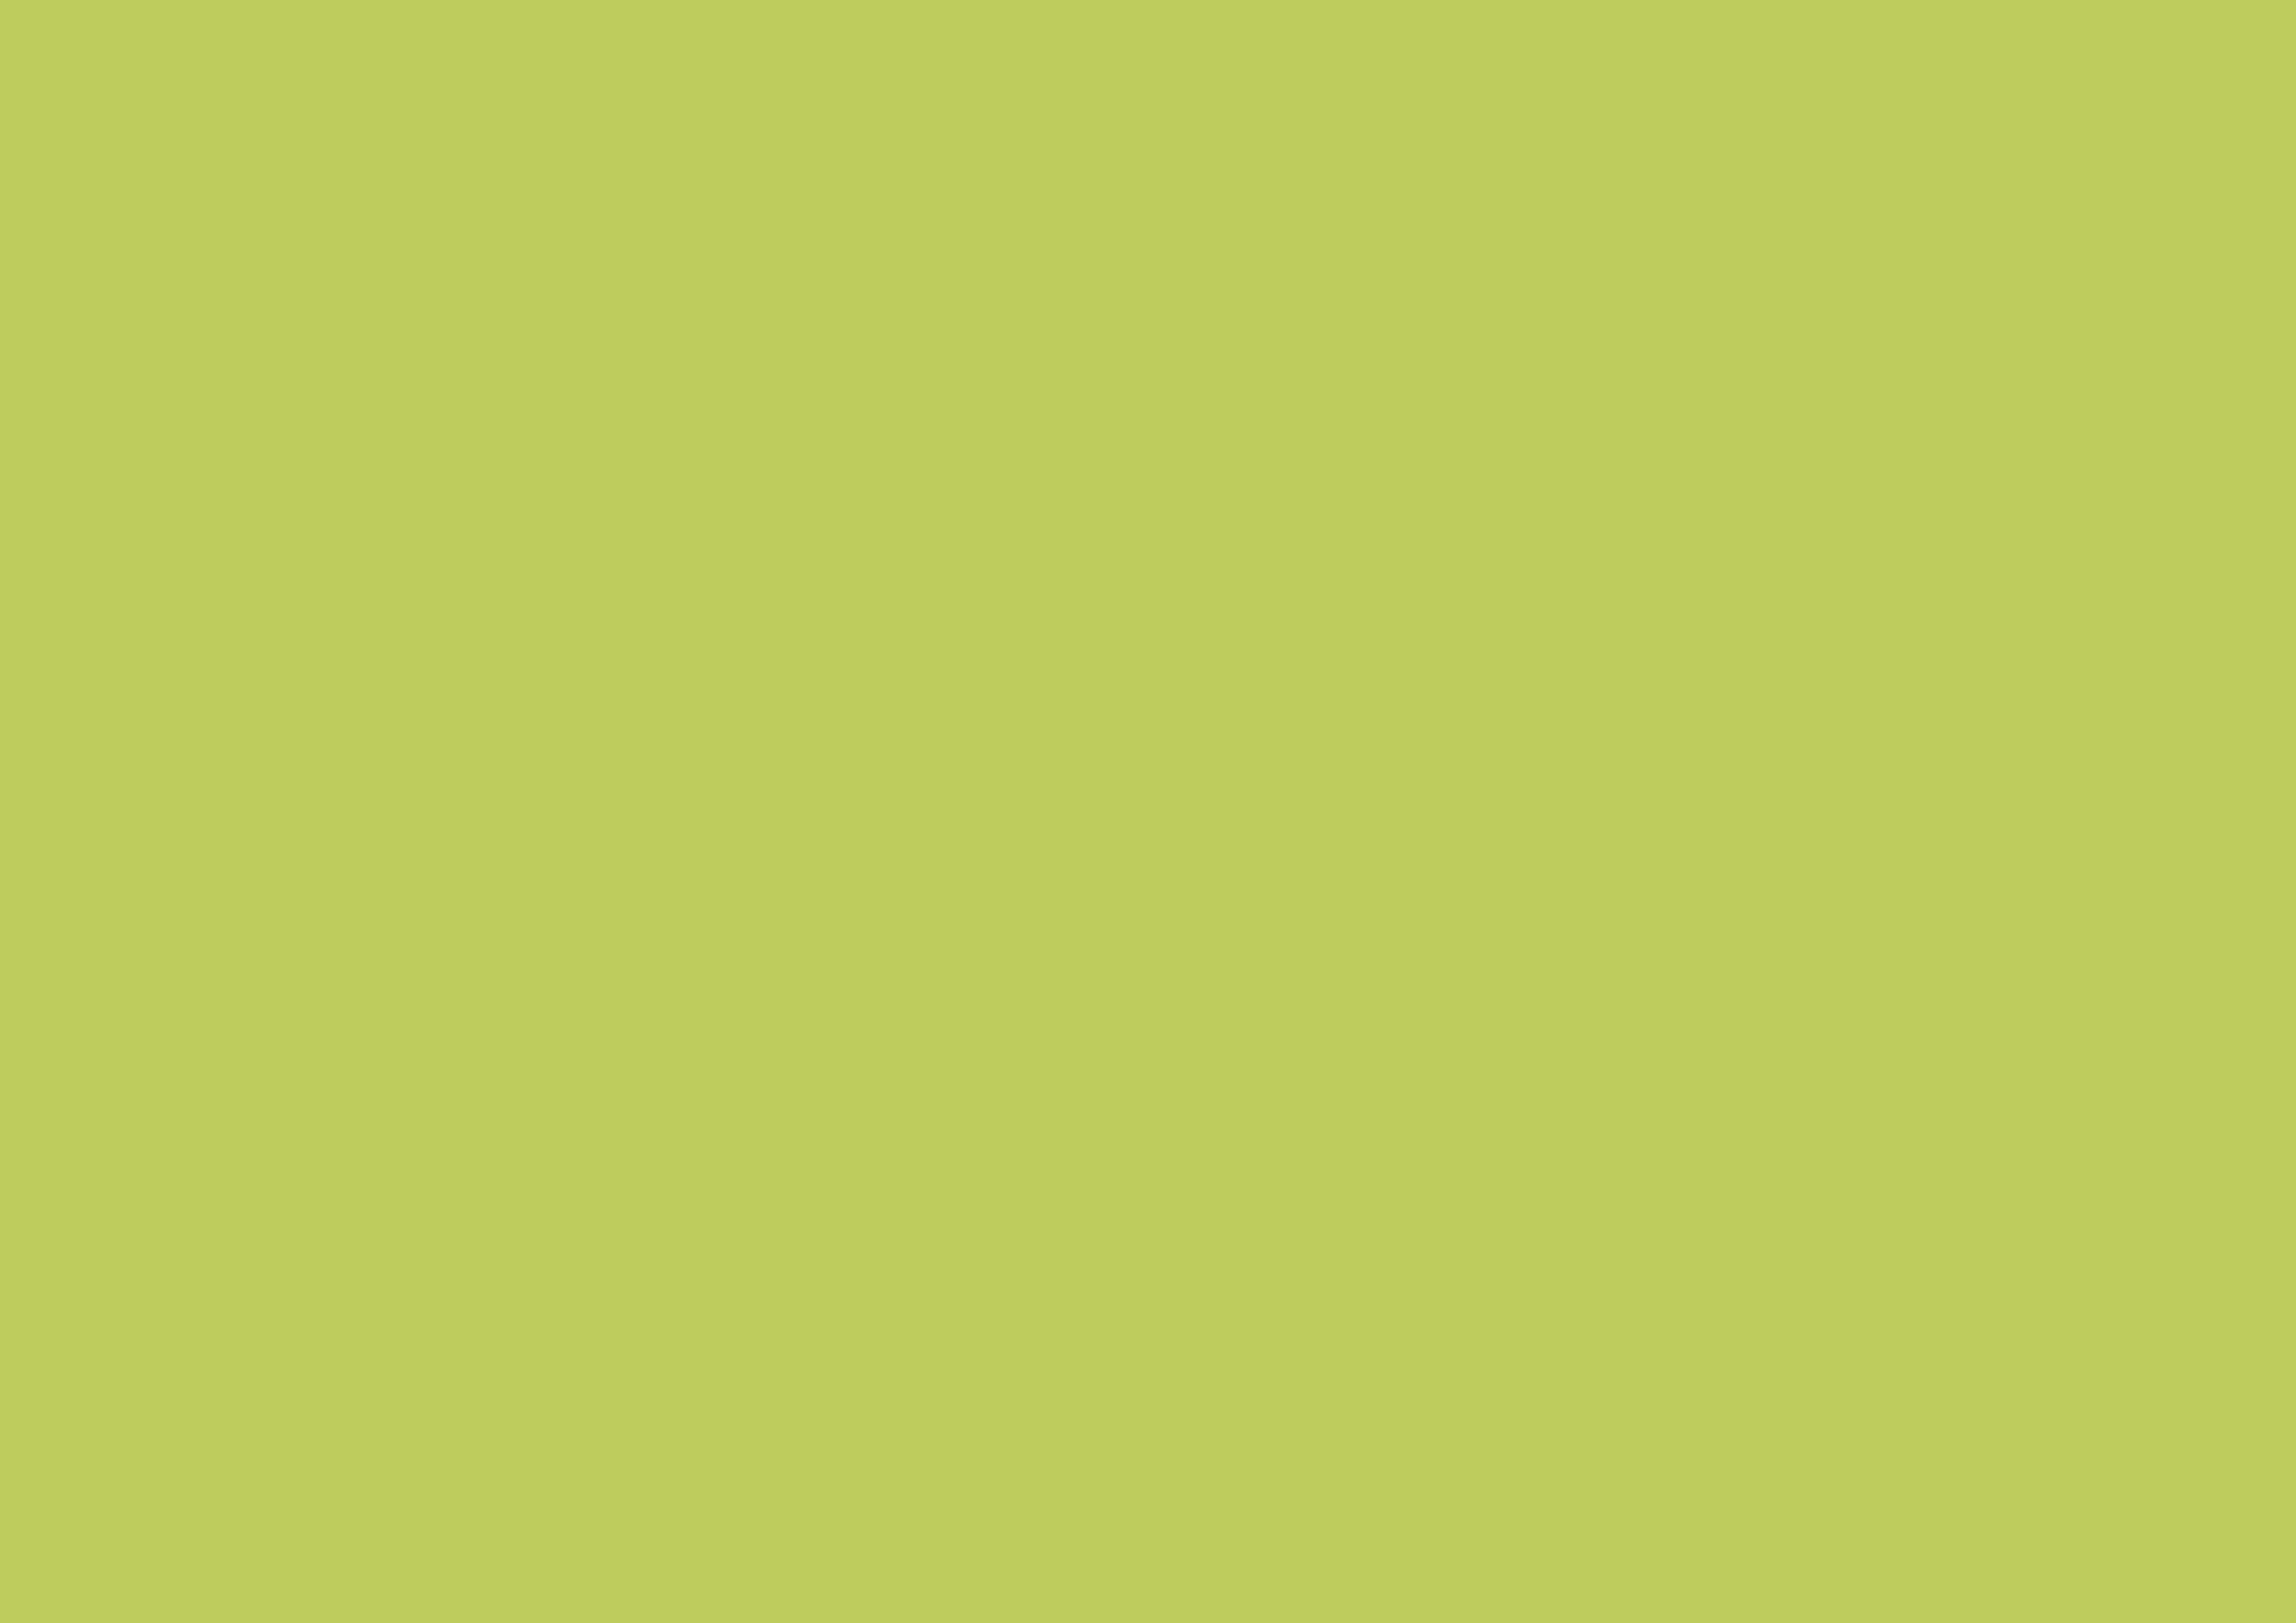 Un peu plus de vert